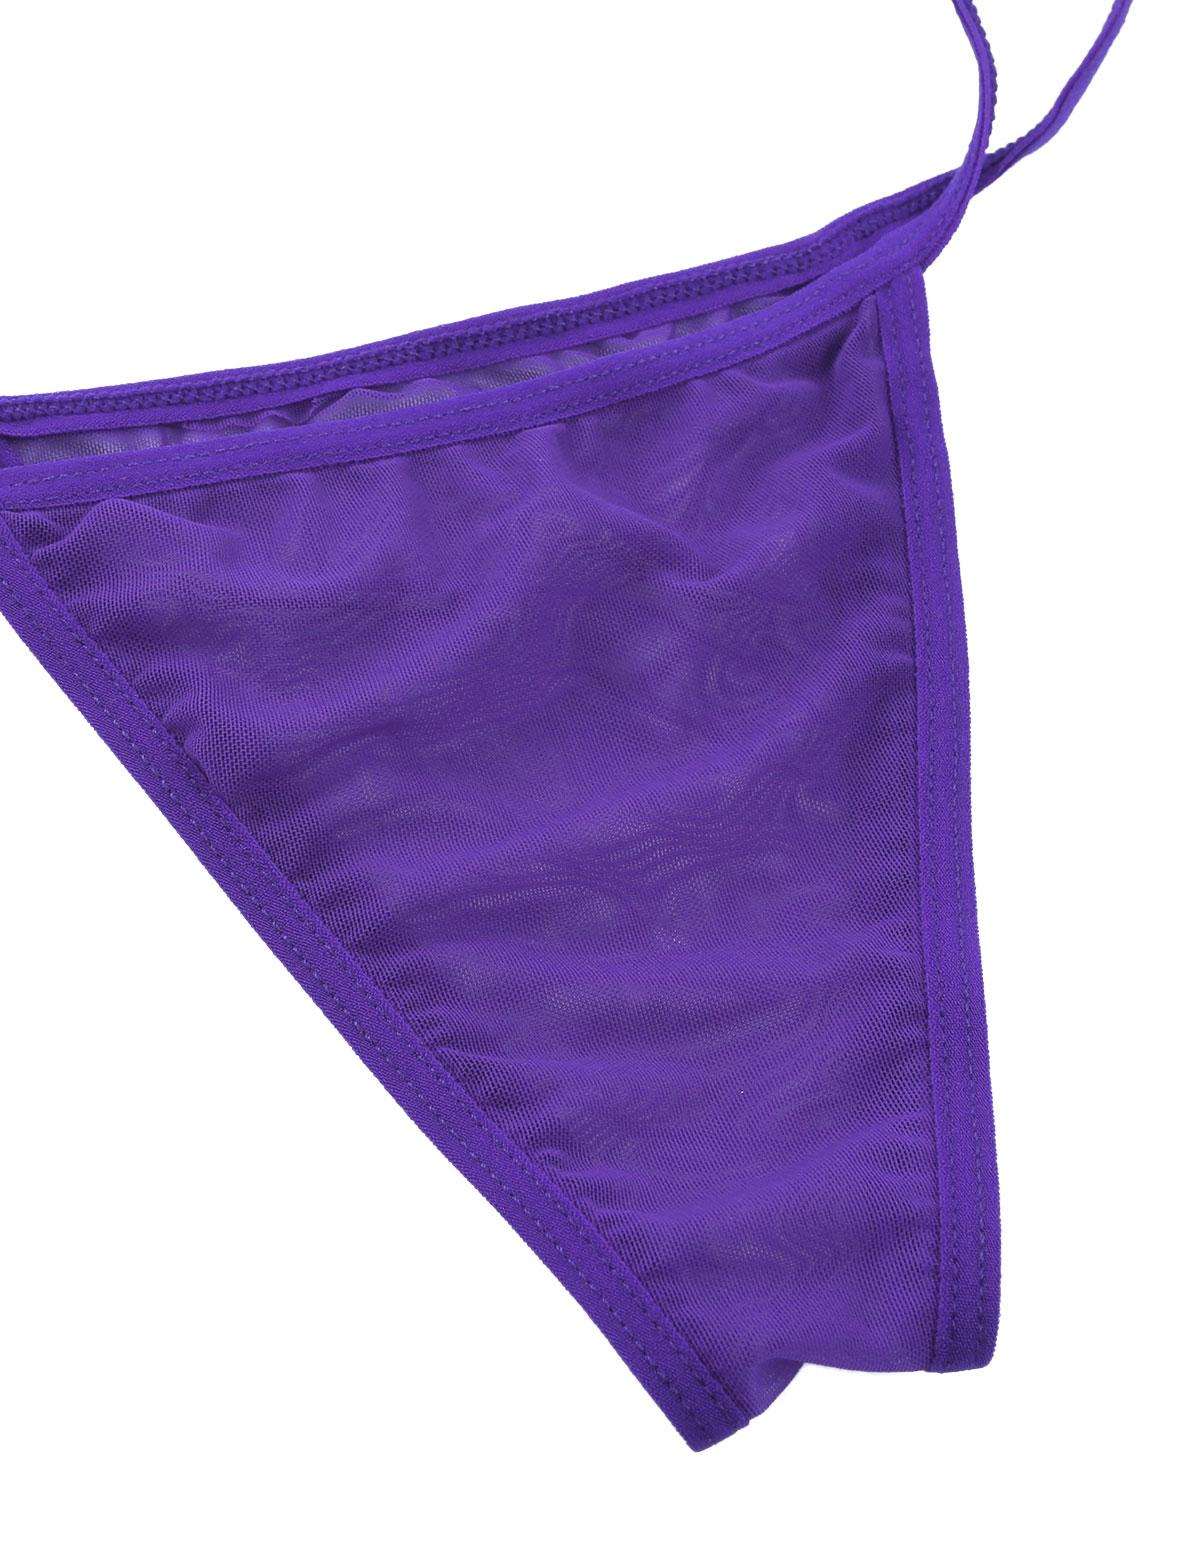 US Sexy Womens One-Piece Bikinis Thong Swimsuit Swimwear